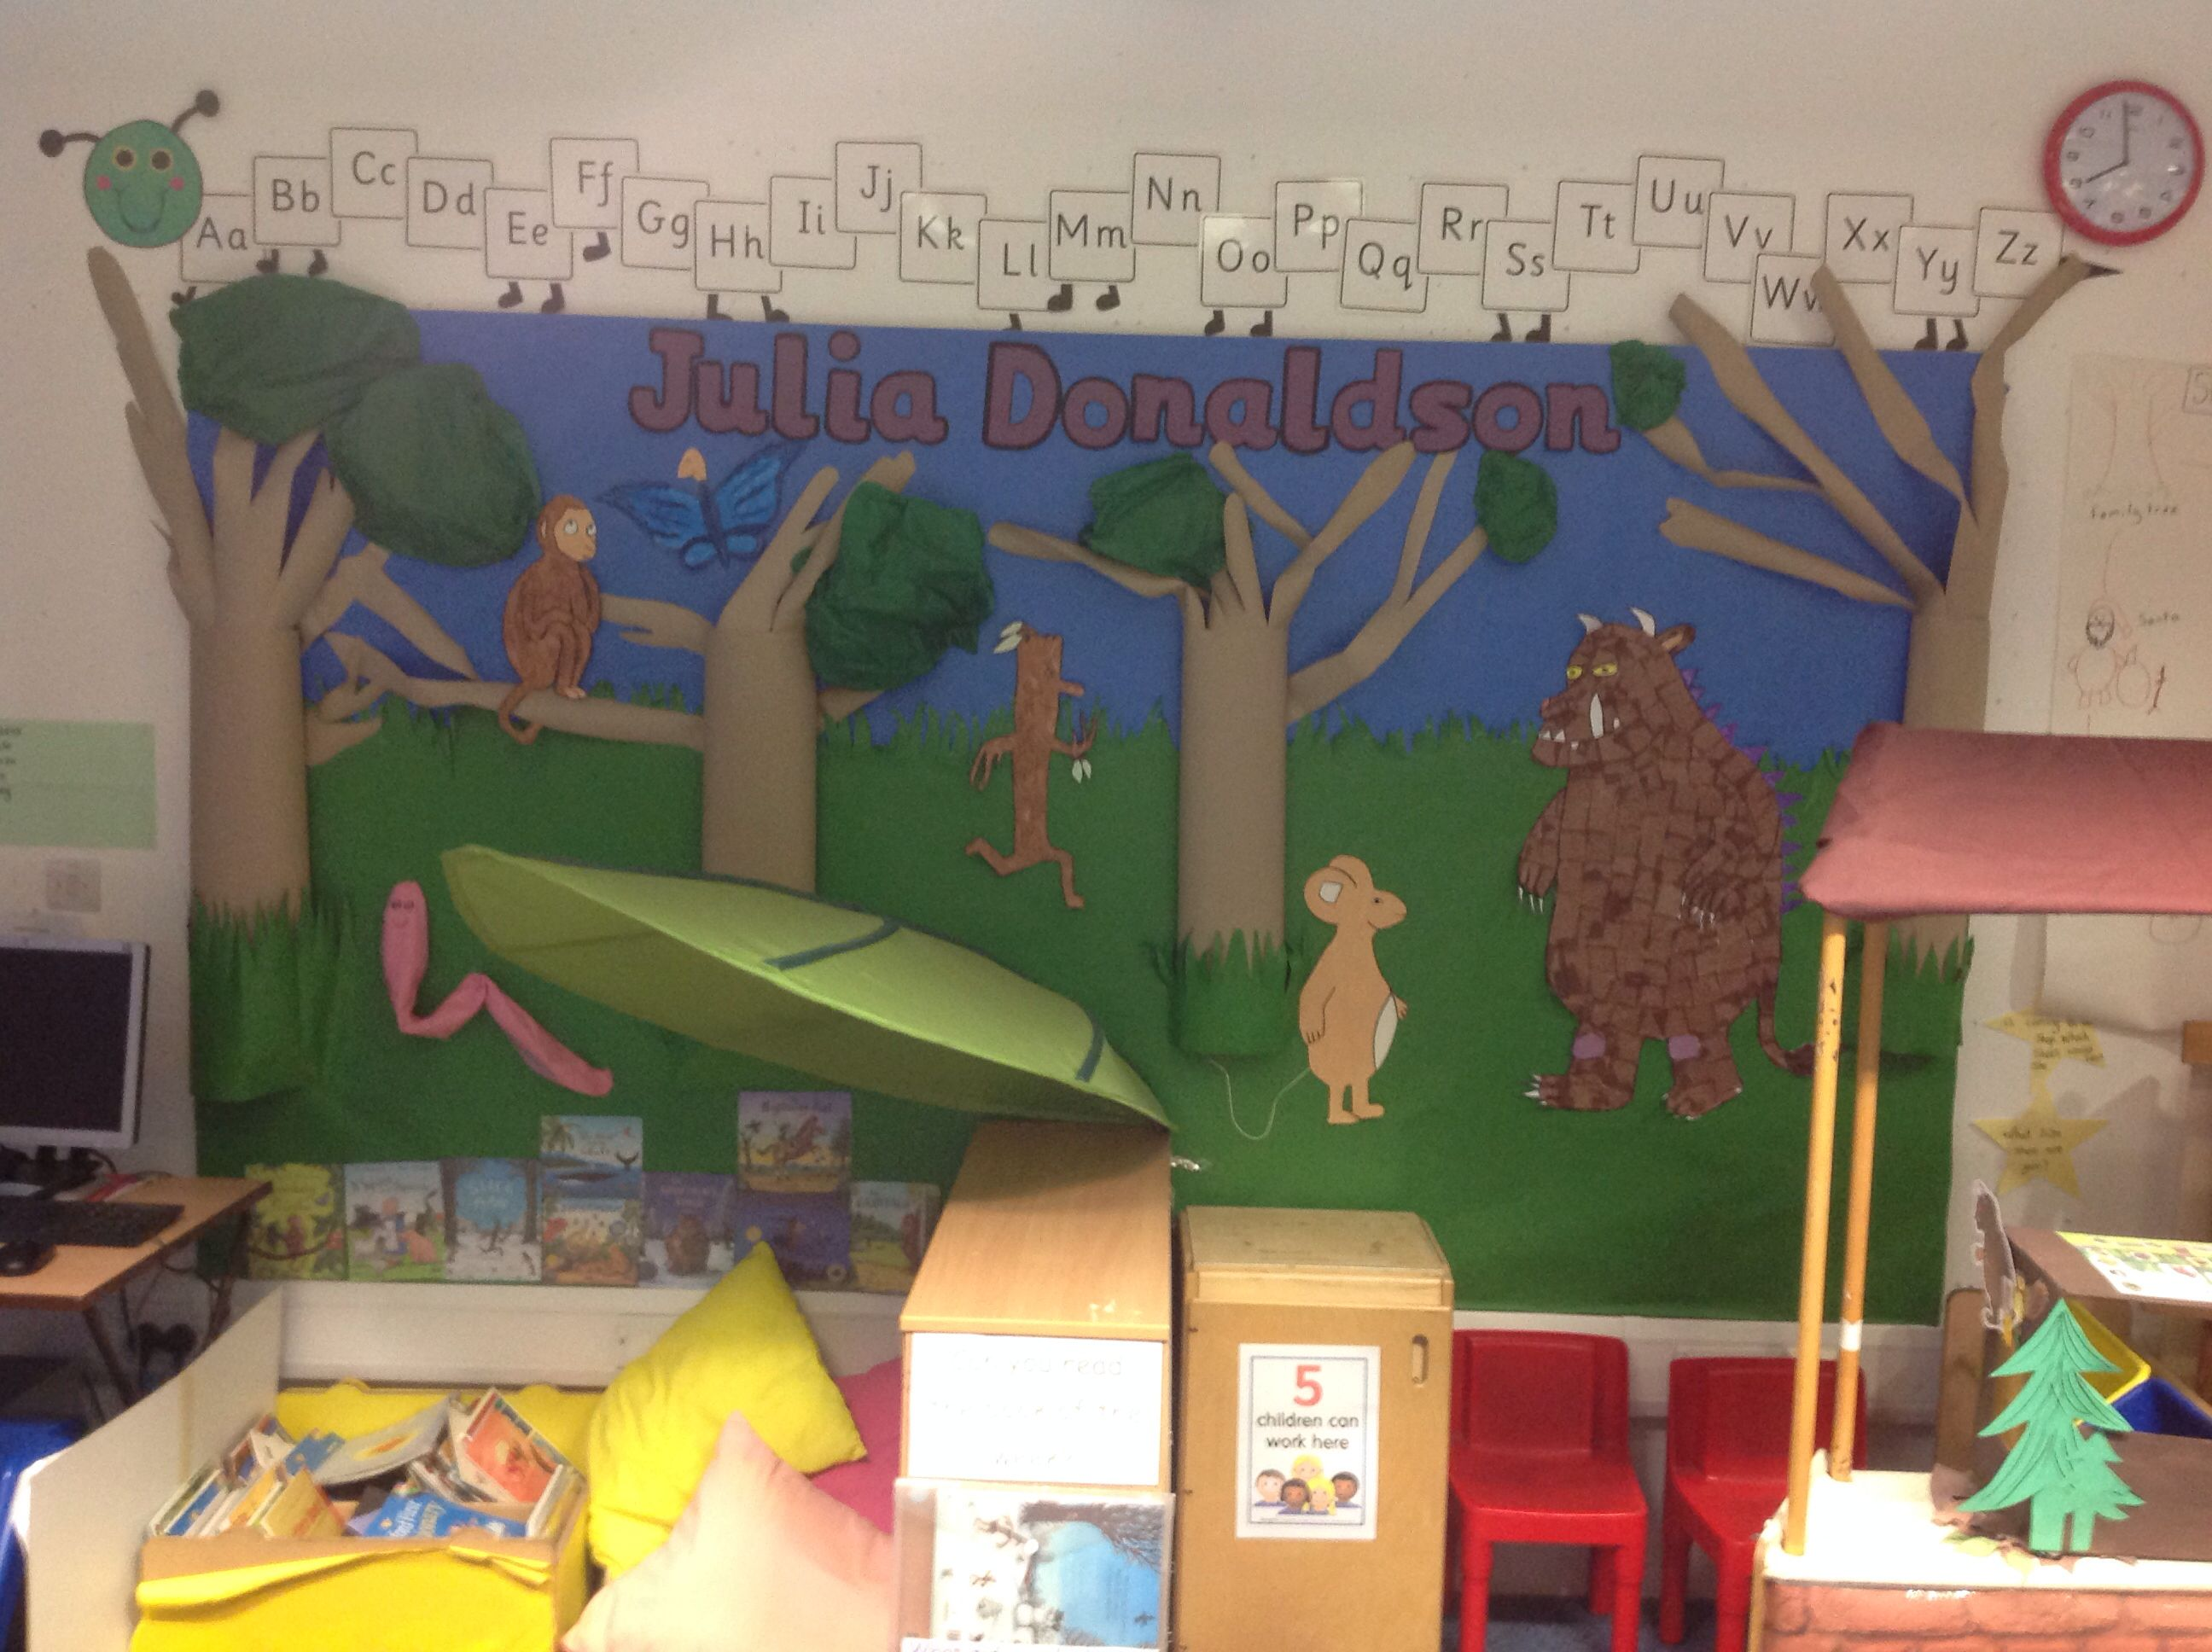 Classroom Decorations Uk : Our julia donaldson classroom display school j